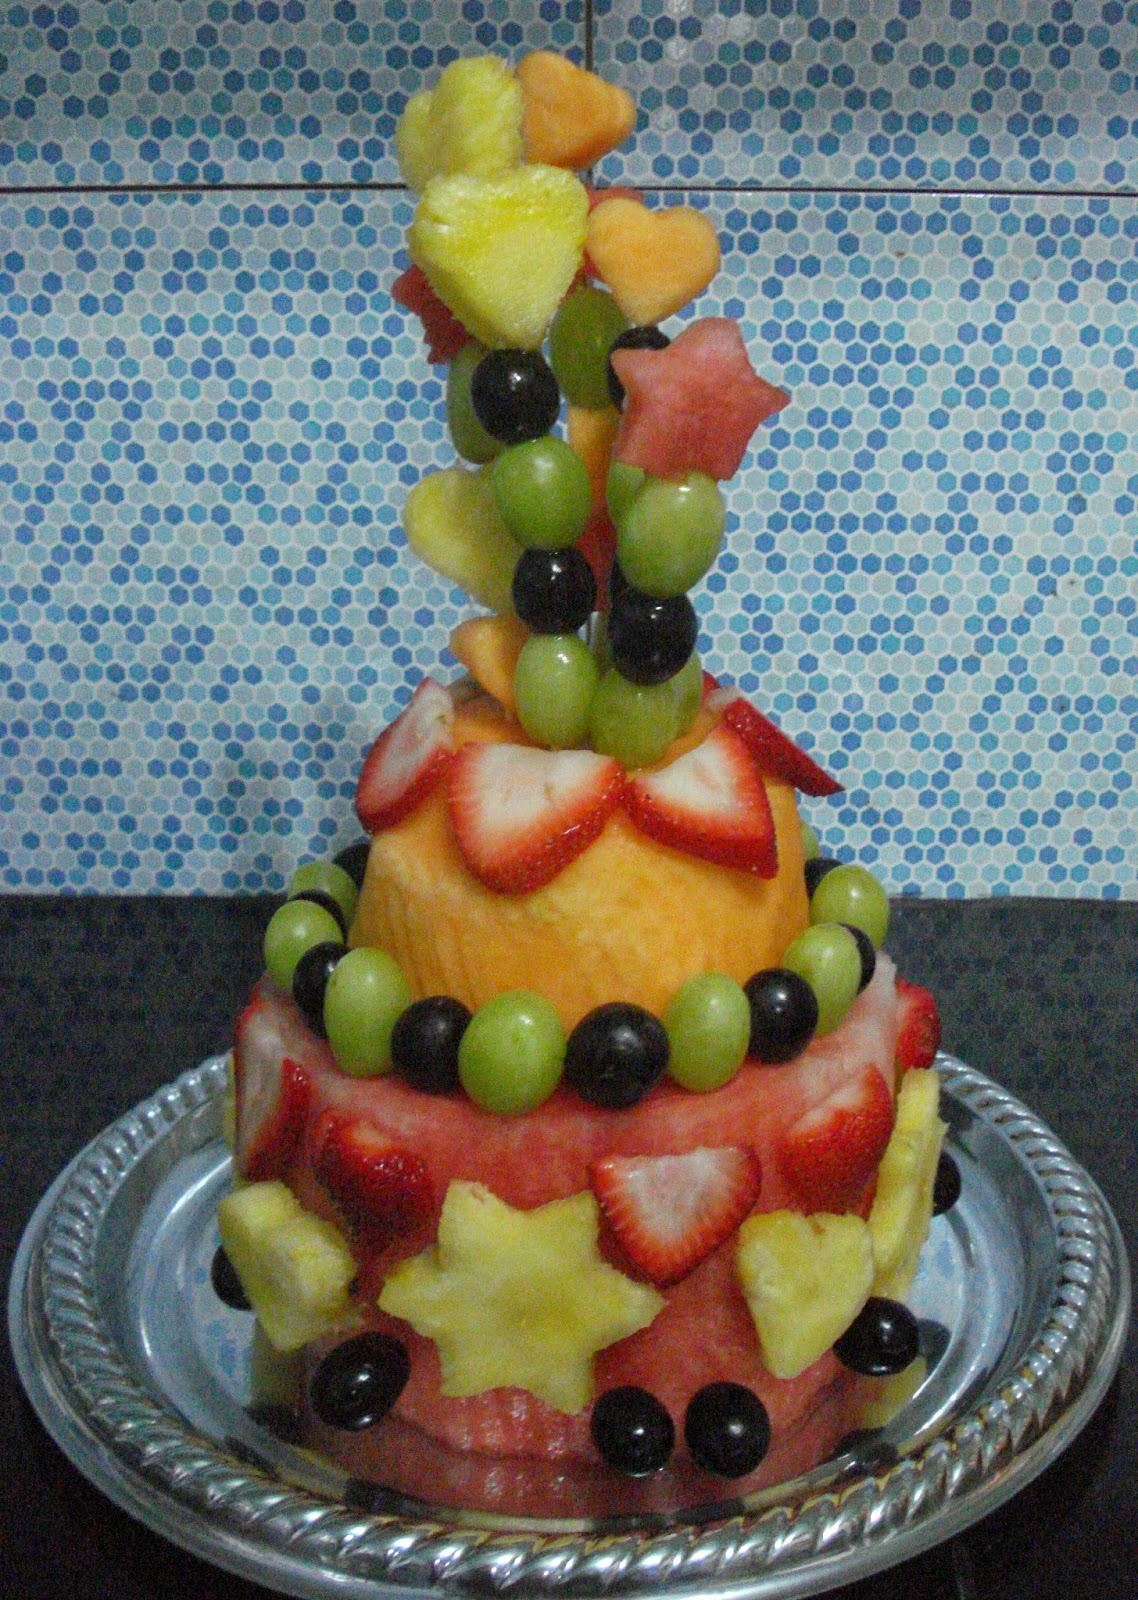 Edible Cake Images Trinidad : Edible Arrangements by FRUITABLES: WATERMELON CAKES